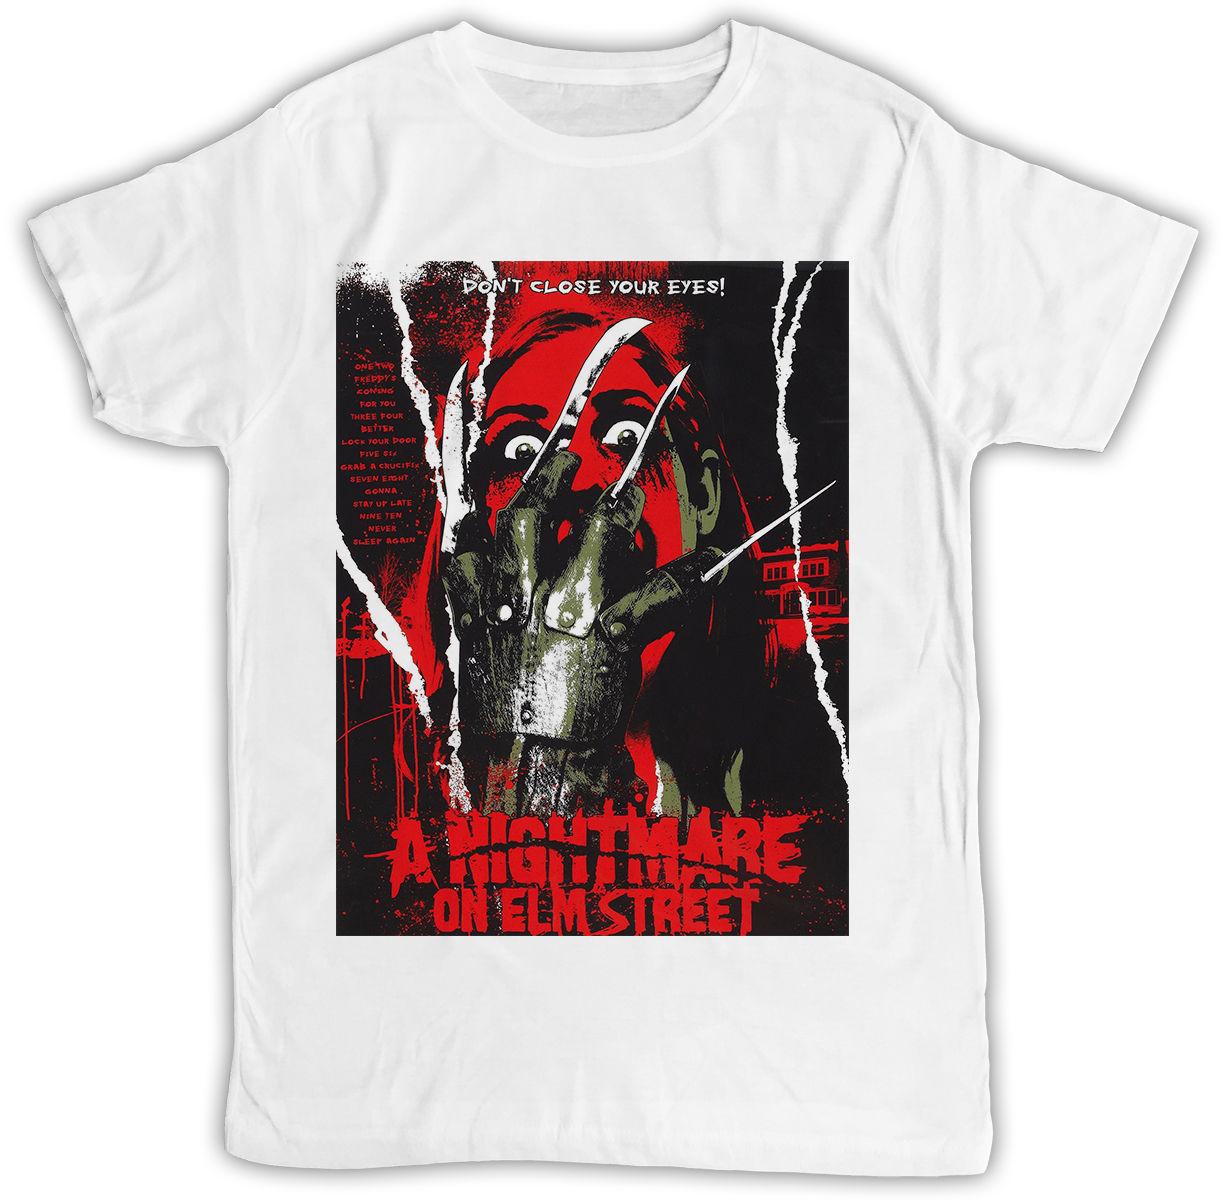 FREDDY KRUEGER ELM STREET película POSTER IDEAL regalo camiseta manga corta Camisetas marca ropa divertida camiseta Top